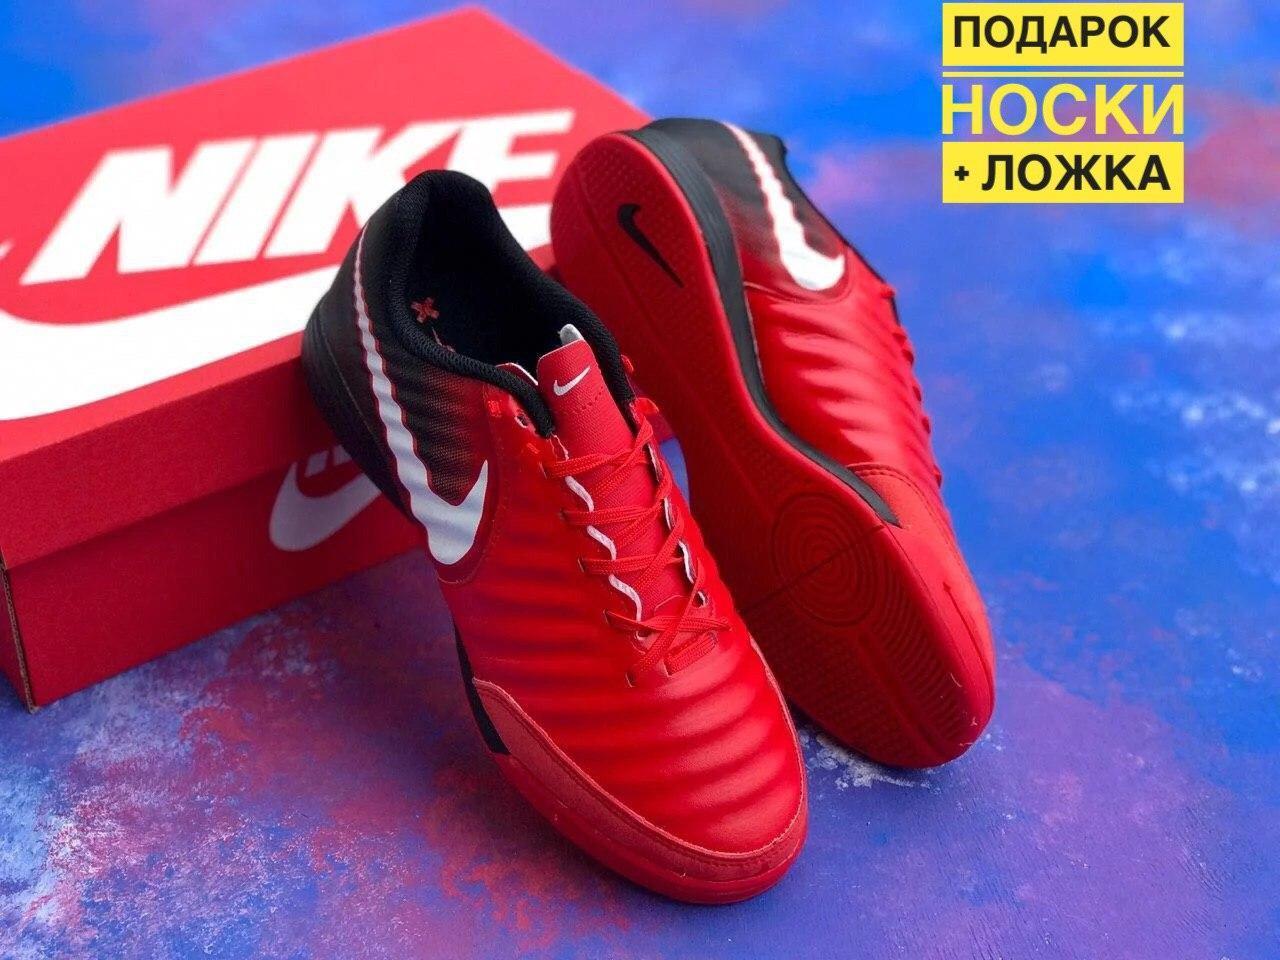 Футзалки Nike Legend X VII бампы найк темпо футбольна взуття